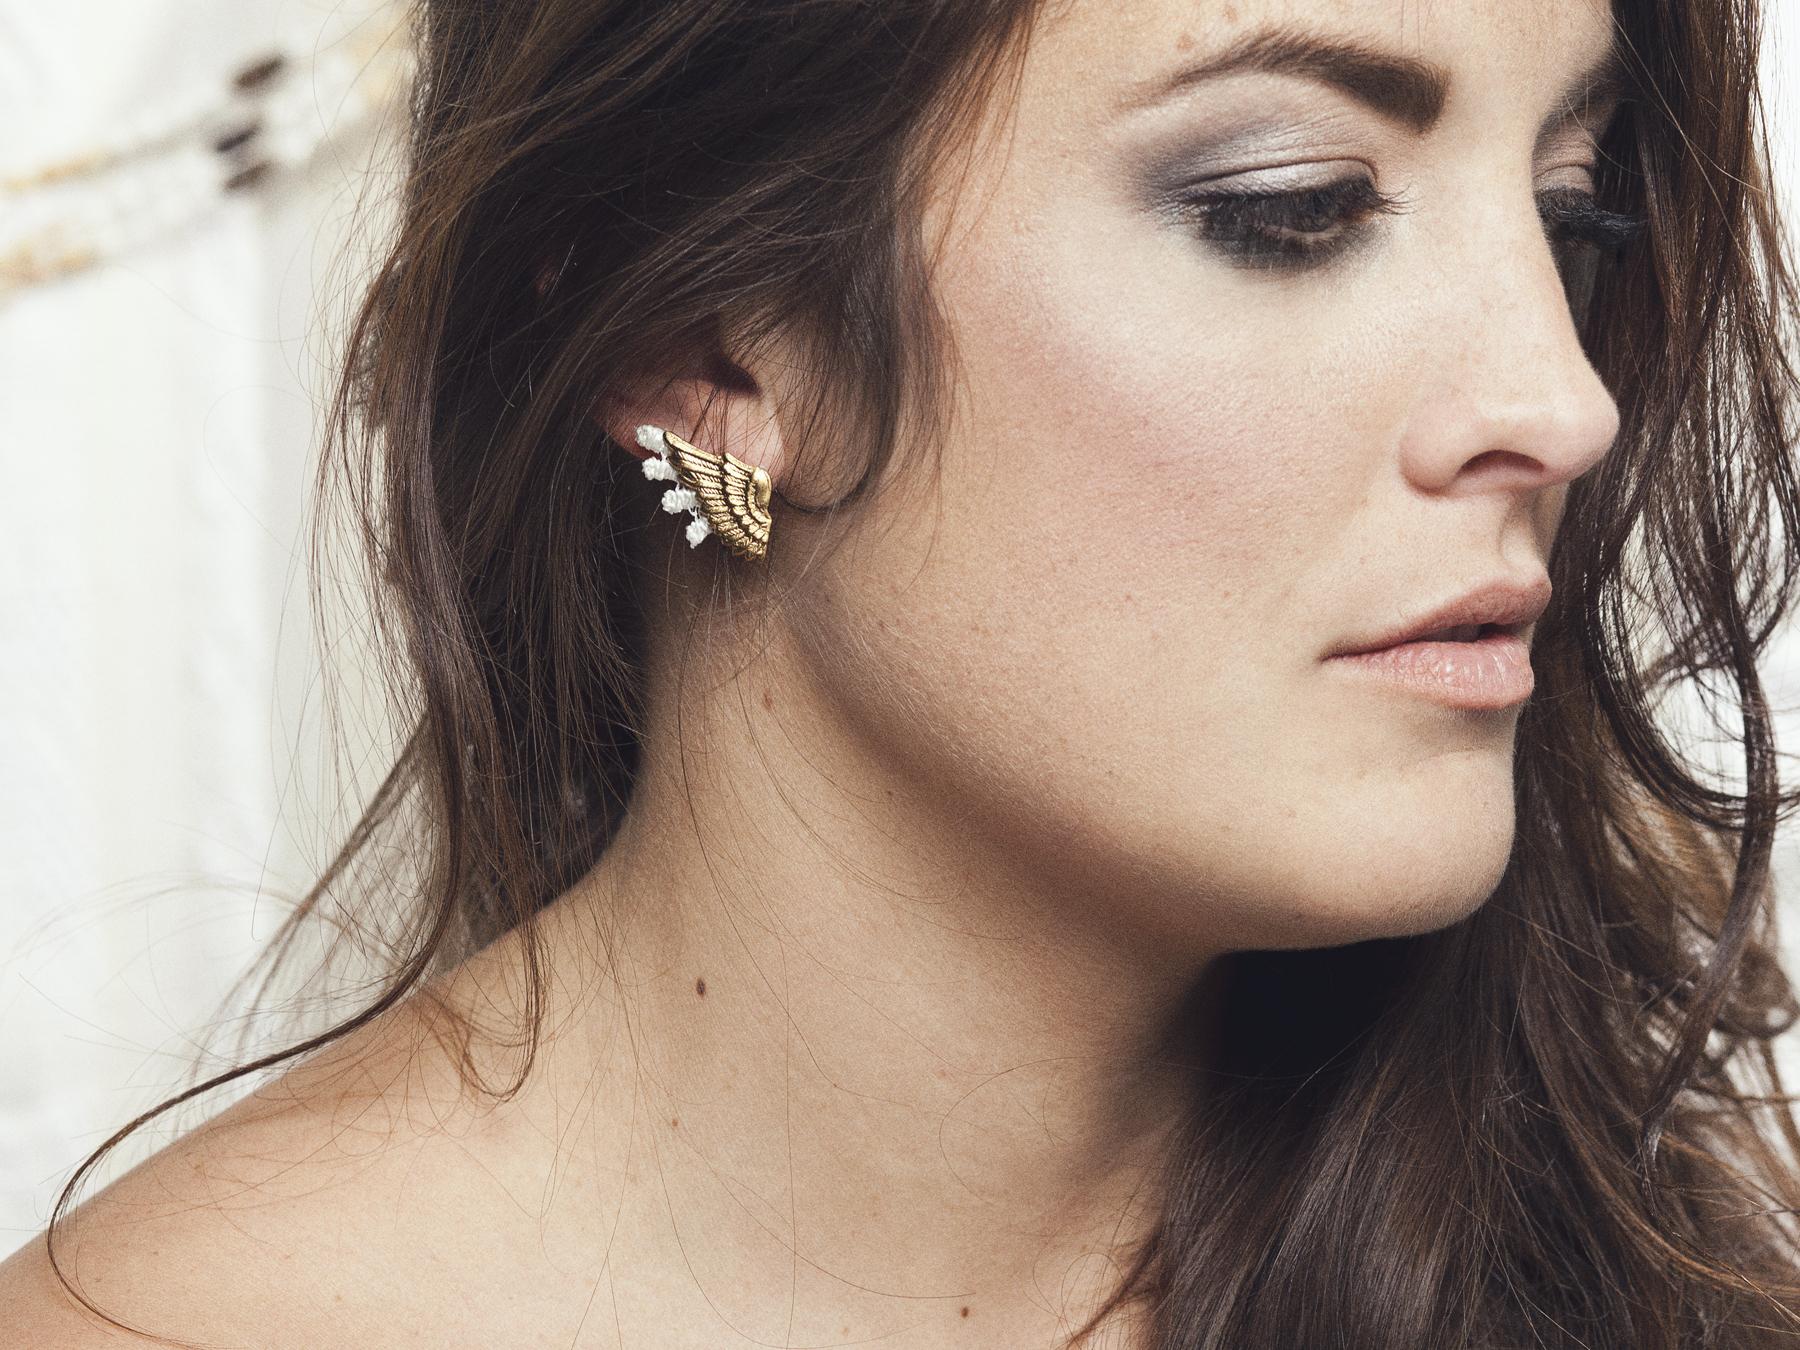 Talaria earrings (details here)